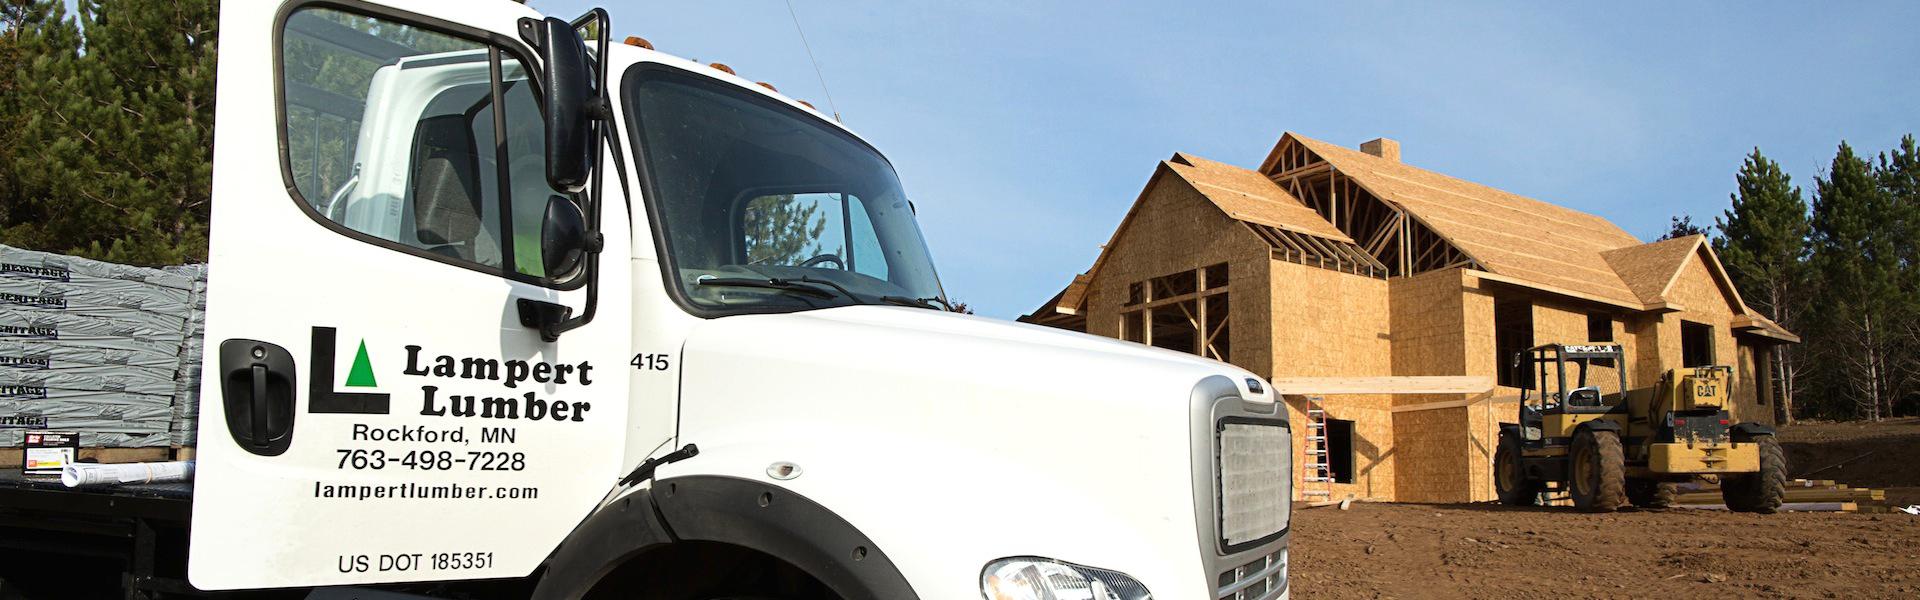 Lampert Lumber Truck